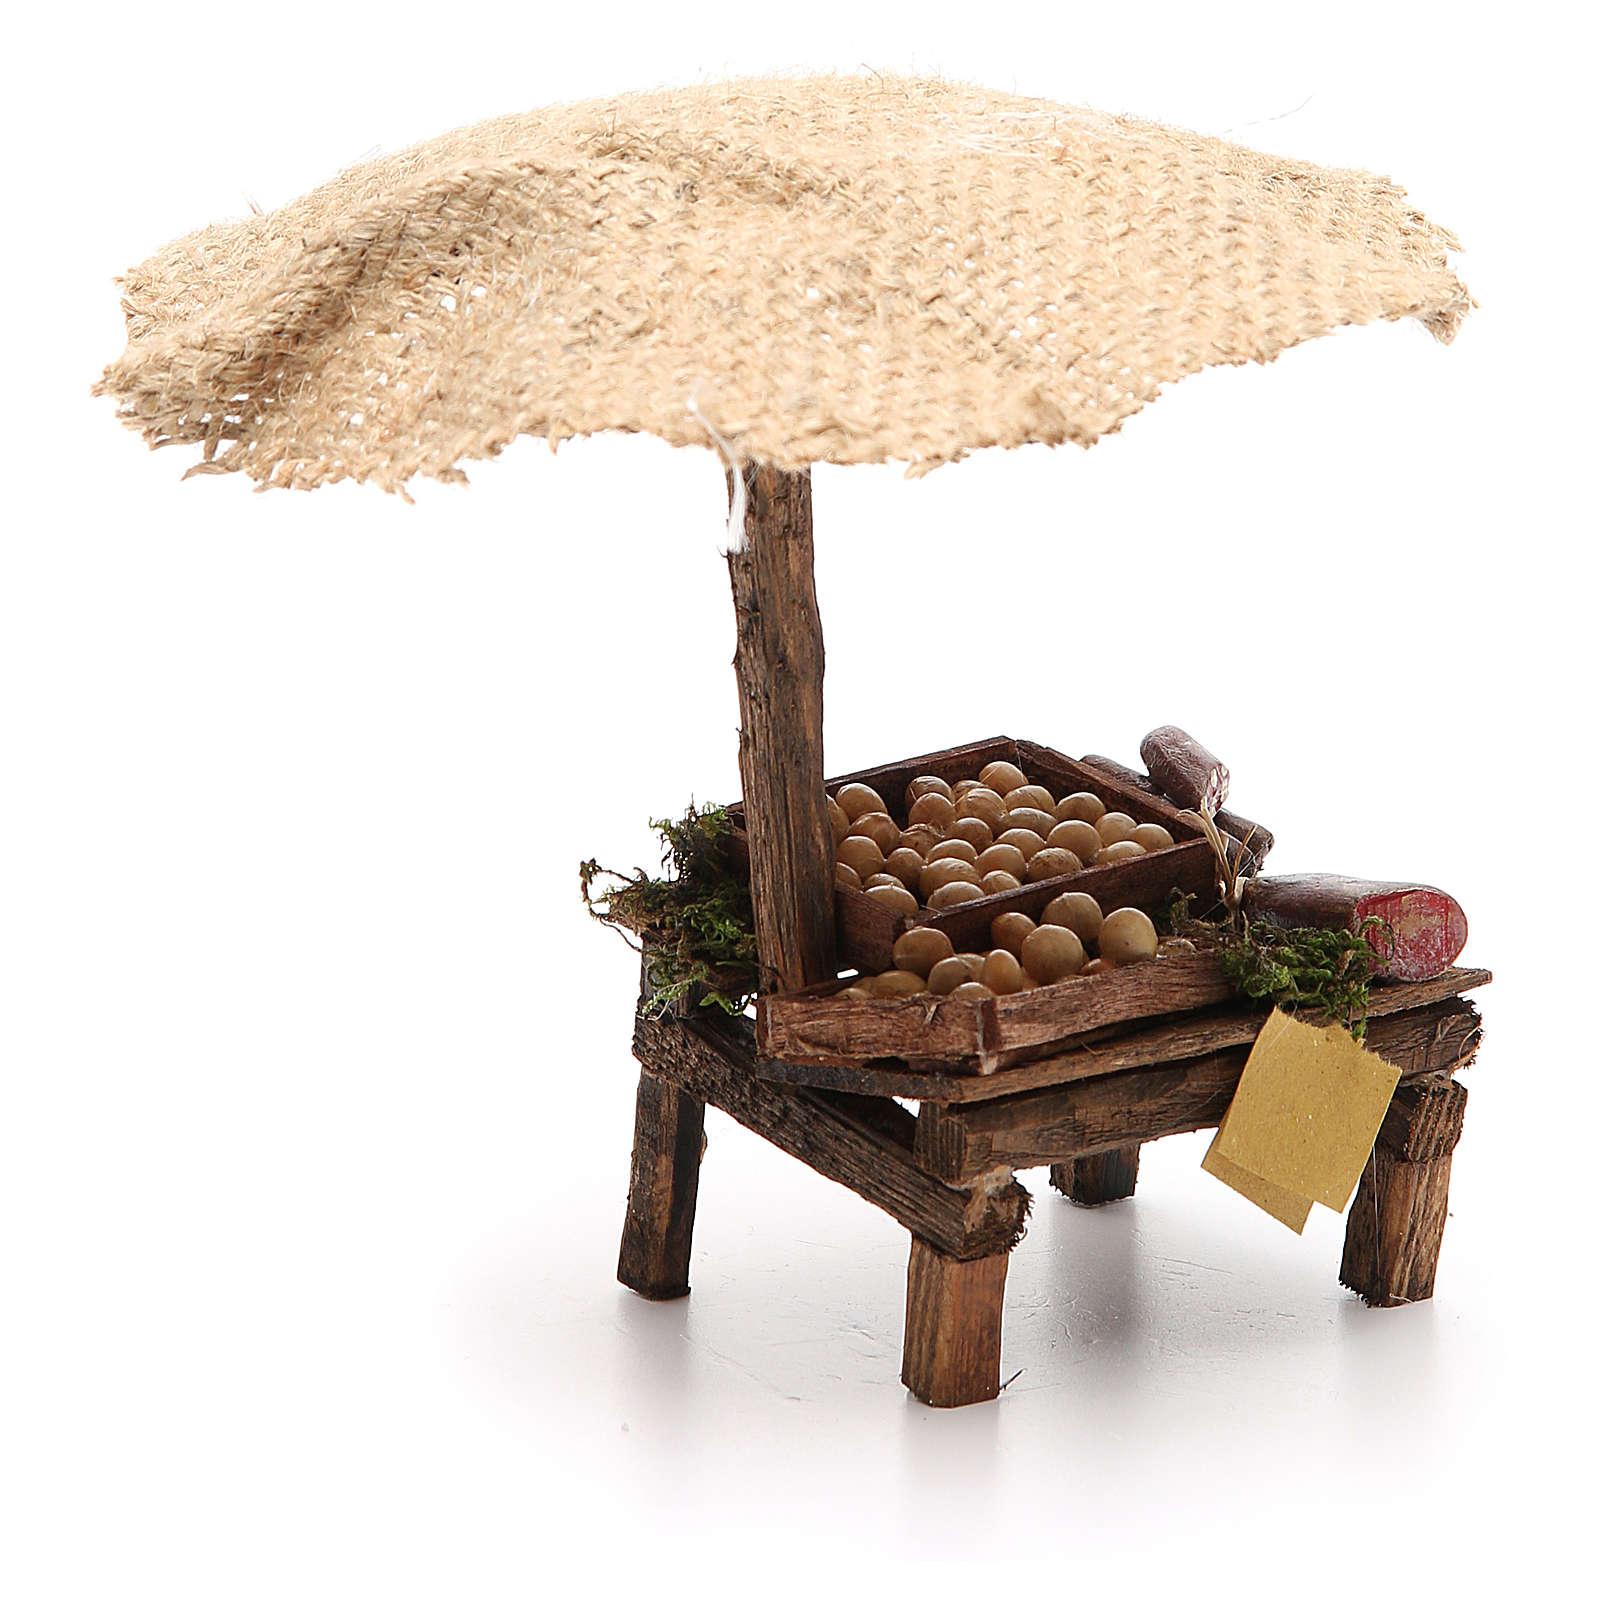 Banca presépio com chapéu-de-sol charcutaria e ovos 16x10x12 cm 4